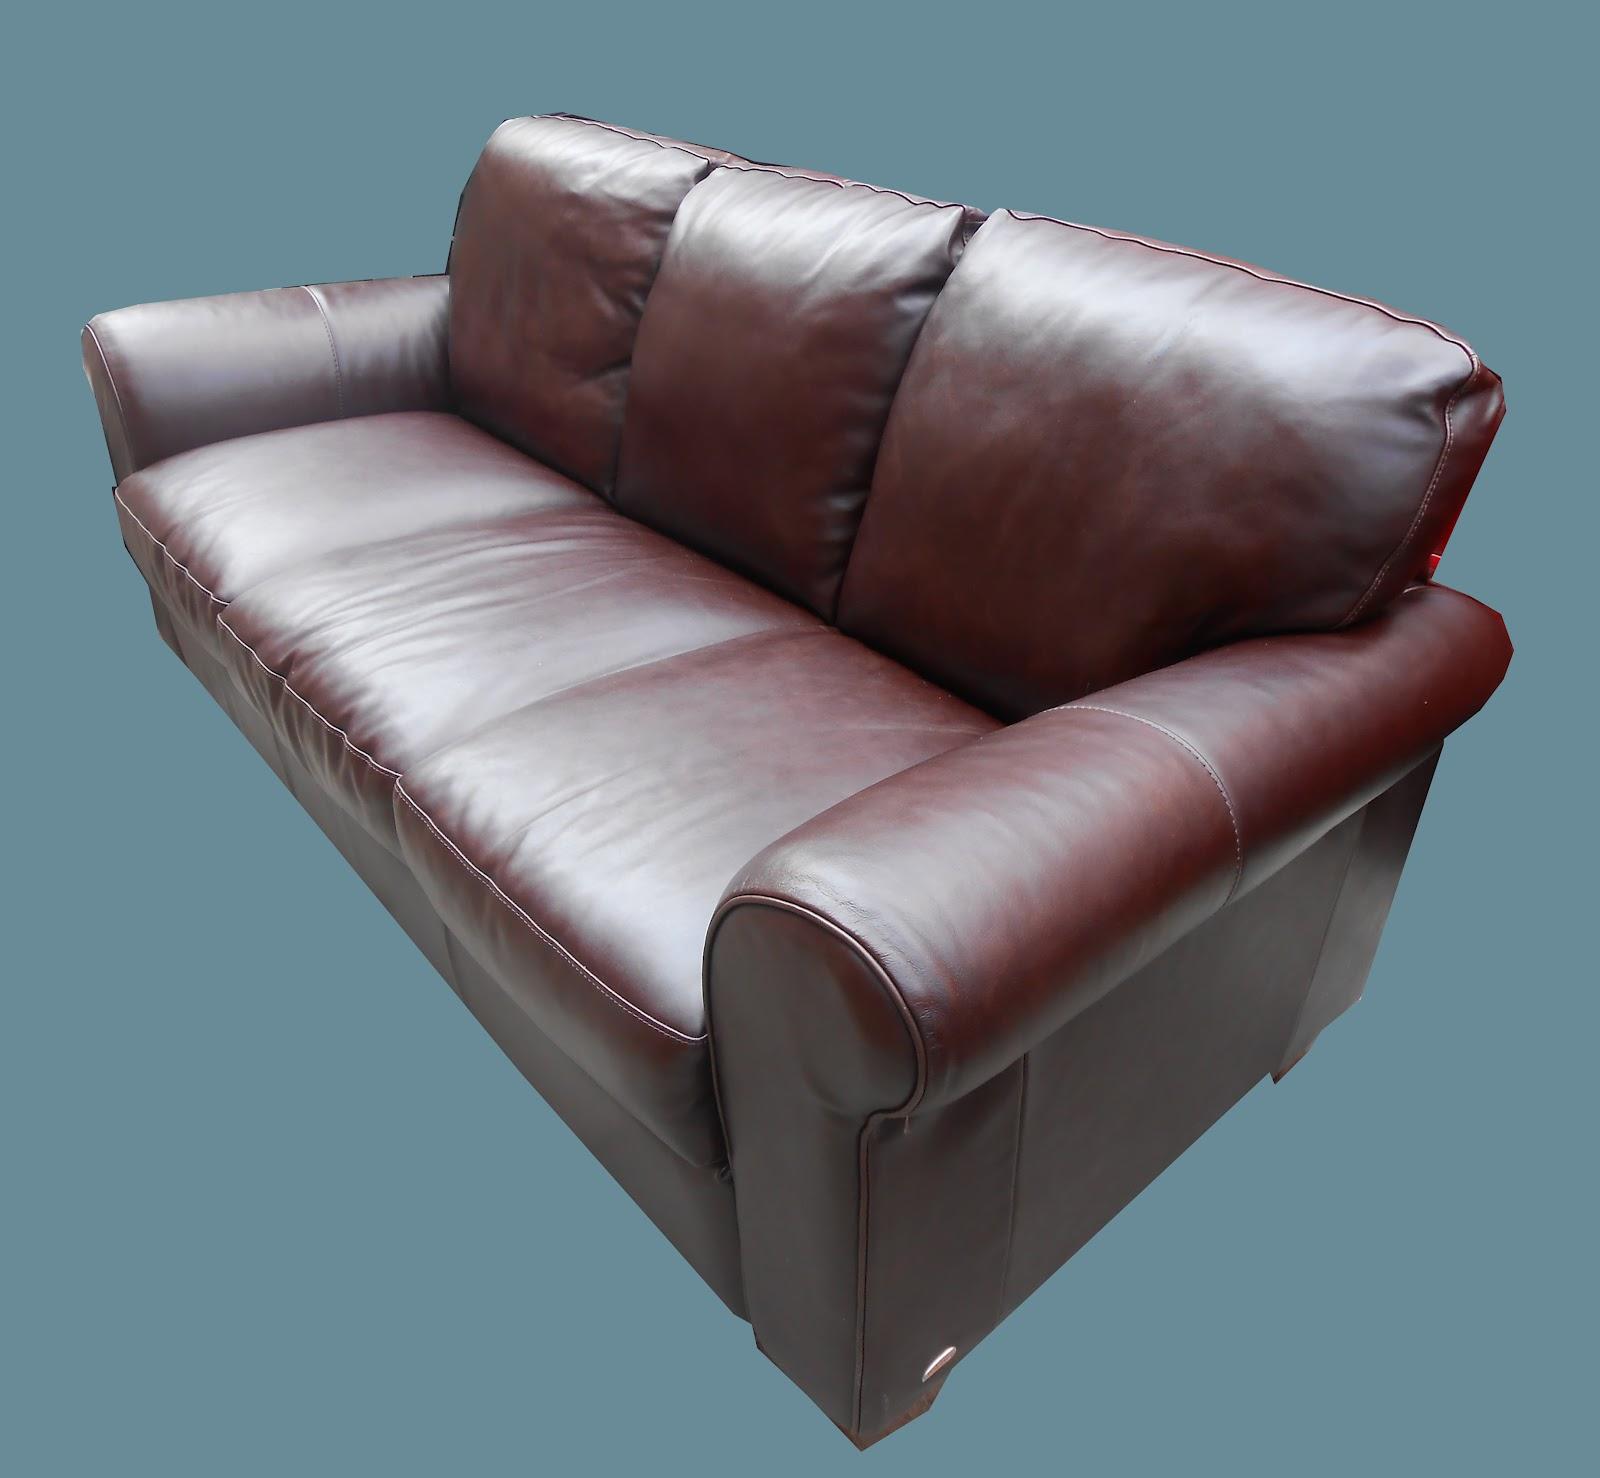 Uhuru Furniture Amp Collectibles Italsofa Leather Sofa Sold